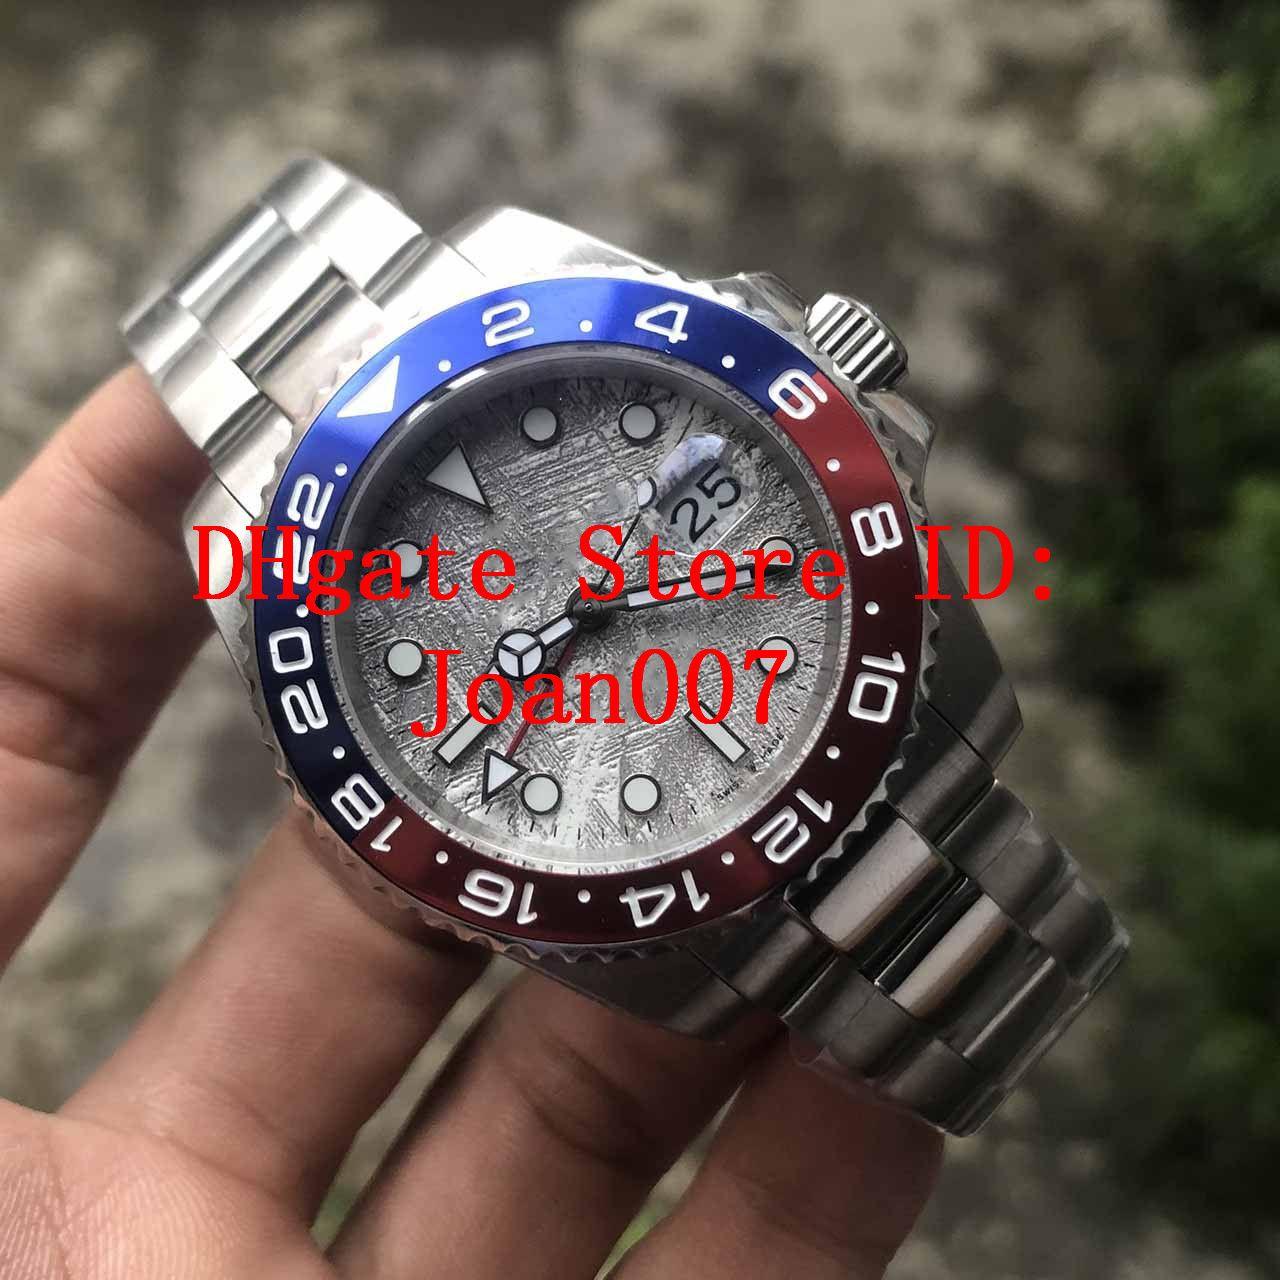 Alta calidad de la roca de ceniza Dial GMT 2813 Mecanismo de relojería azul / rojo de cerámica de 40 mm Bisel Cristal de zafiro 126719 hombre GMT Relojes de pulsera